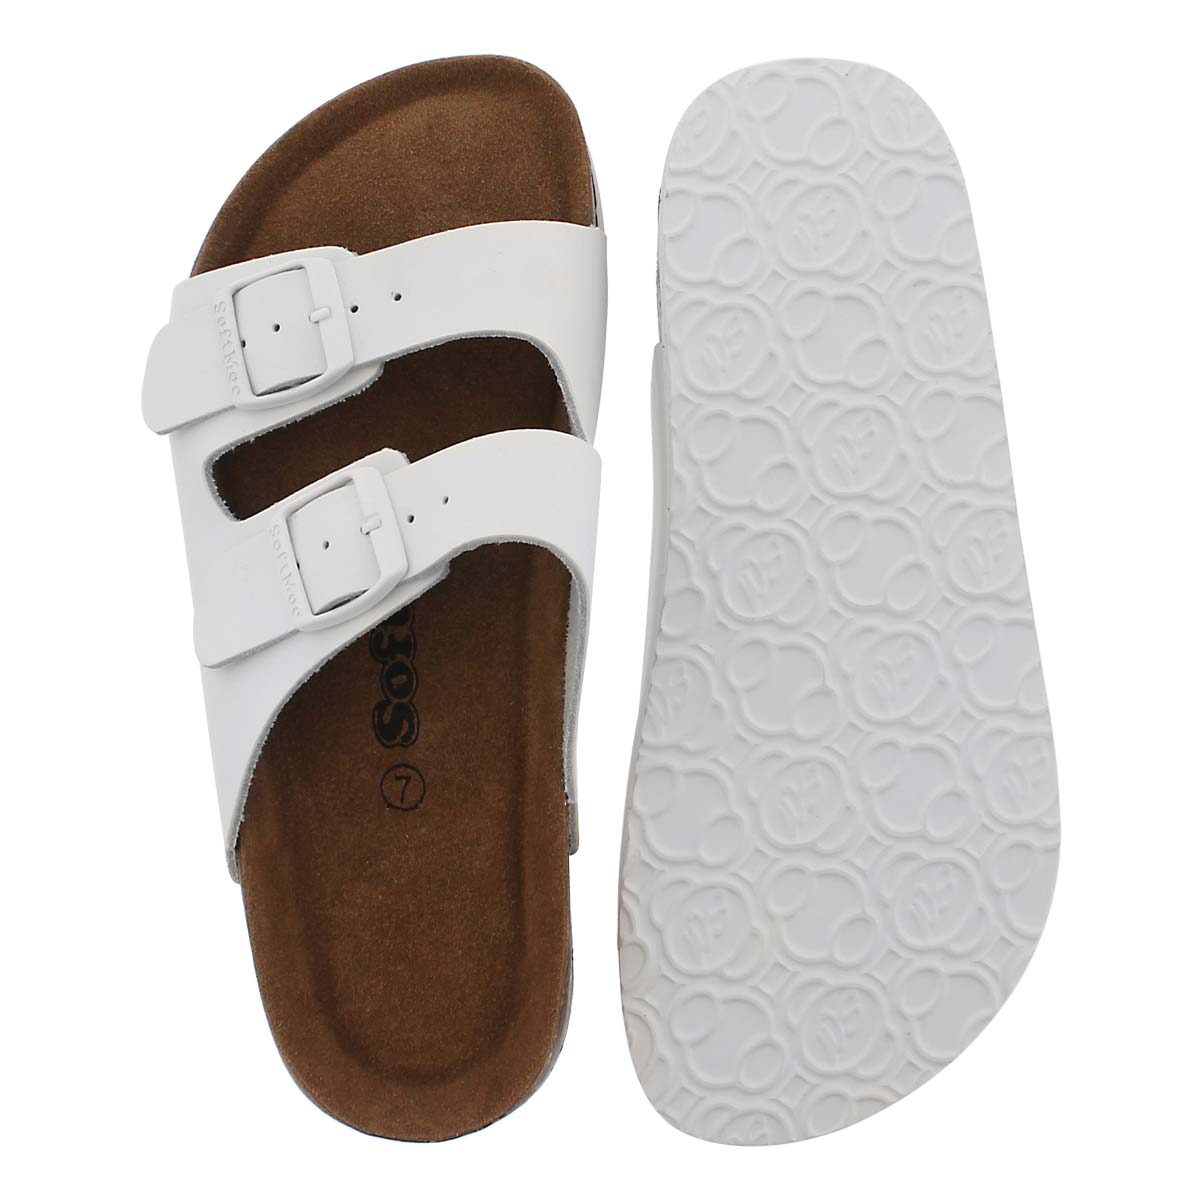 Lds Aliyah 5 wht memory foam slide sndl